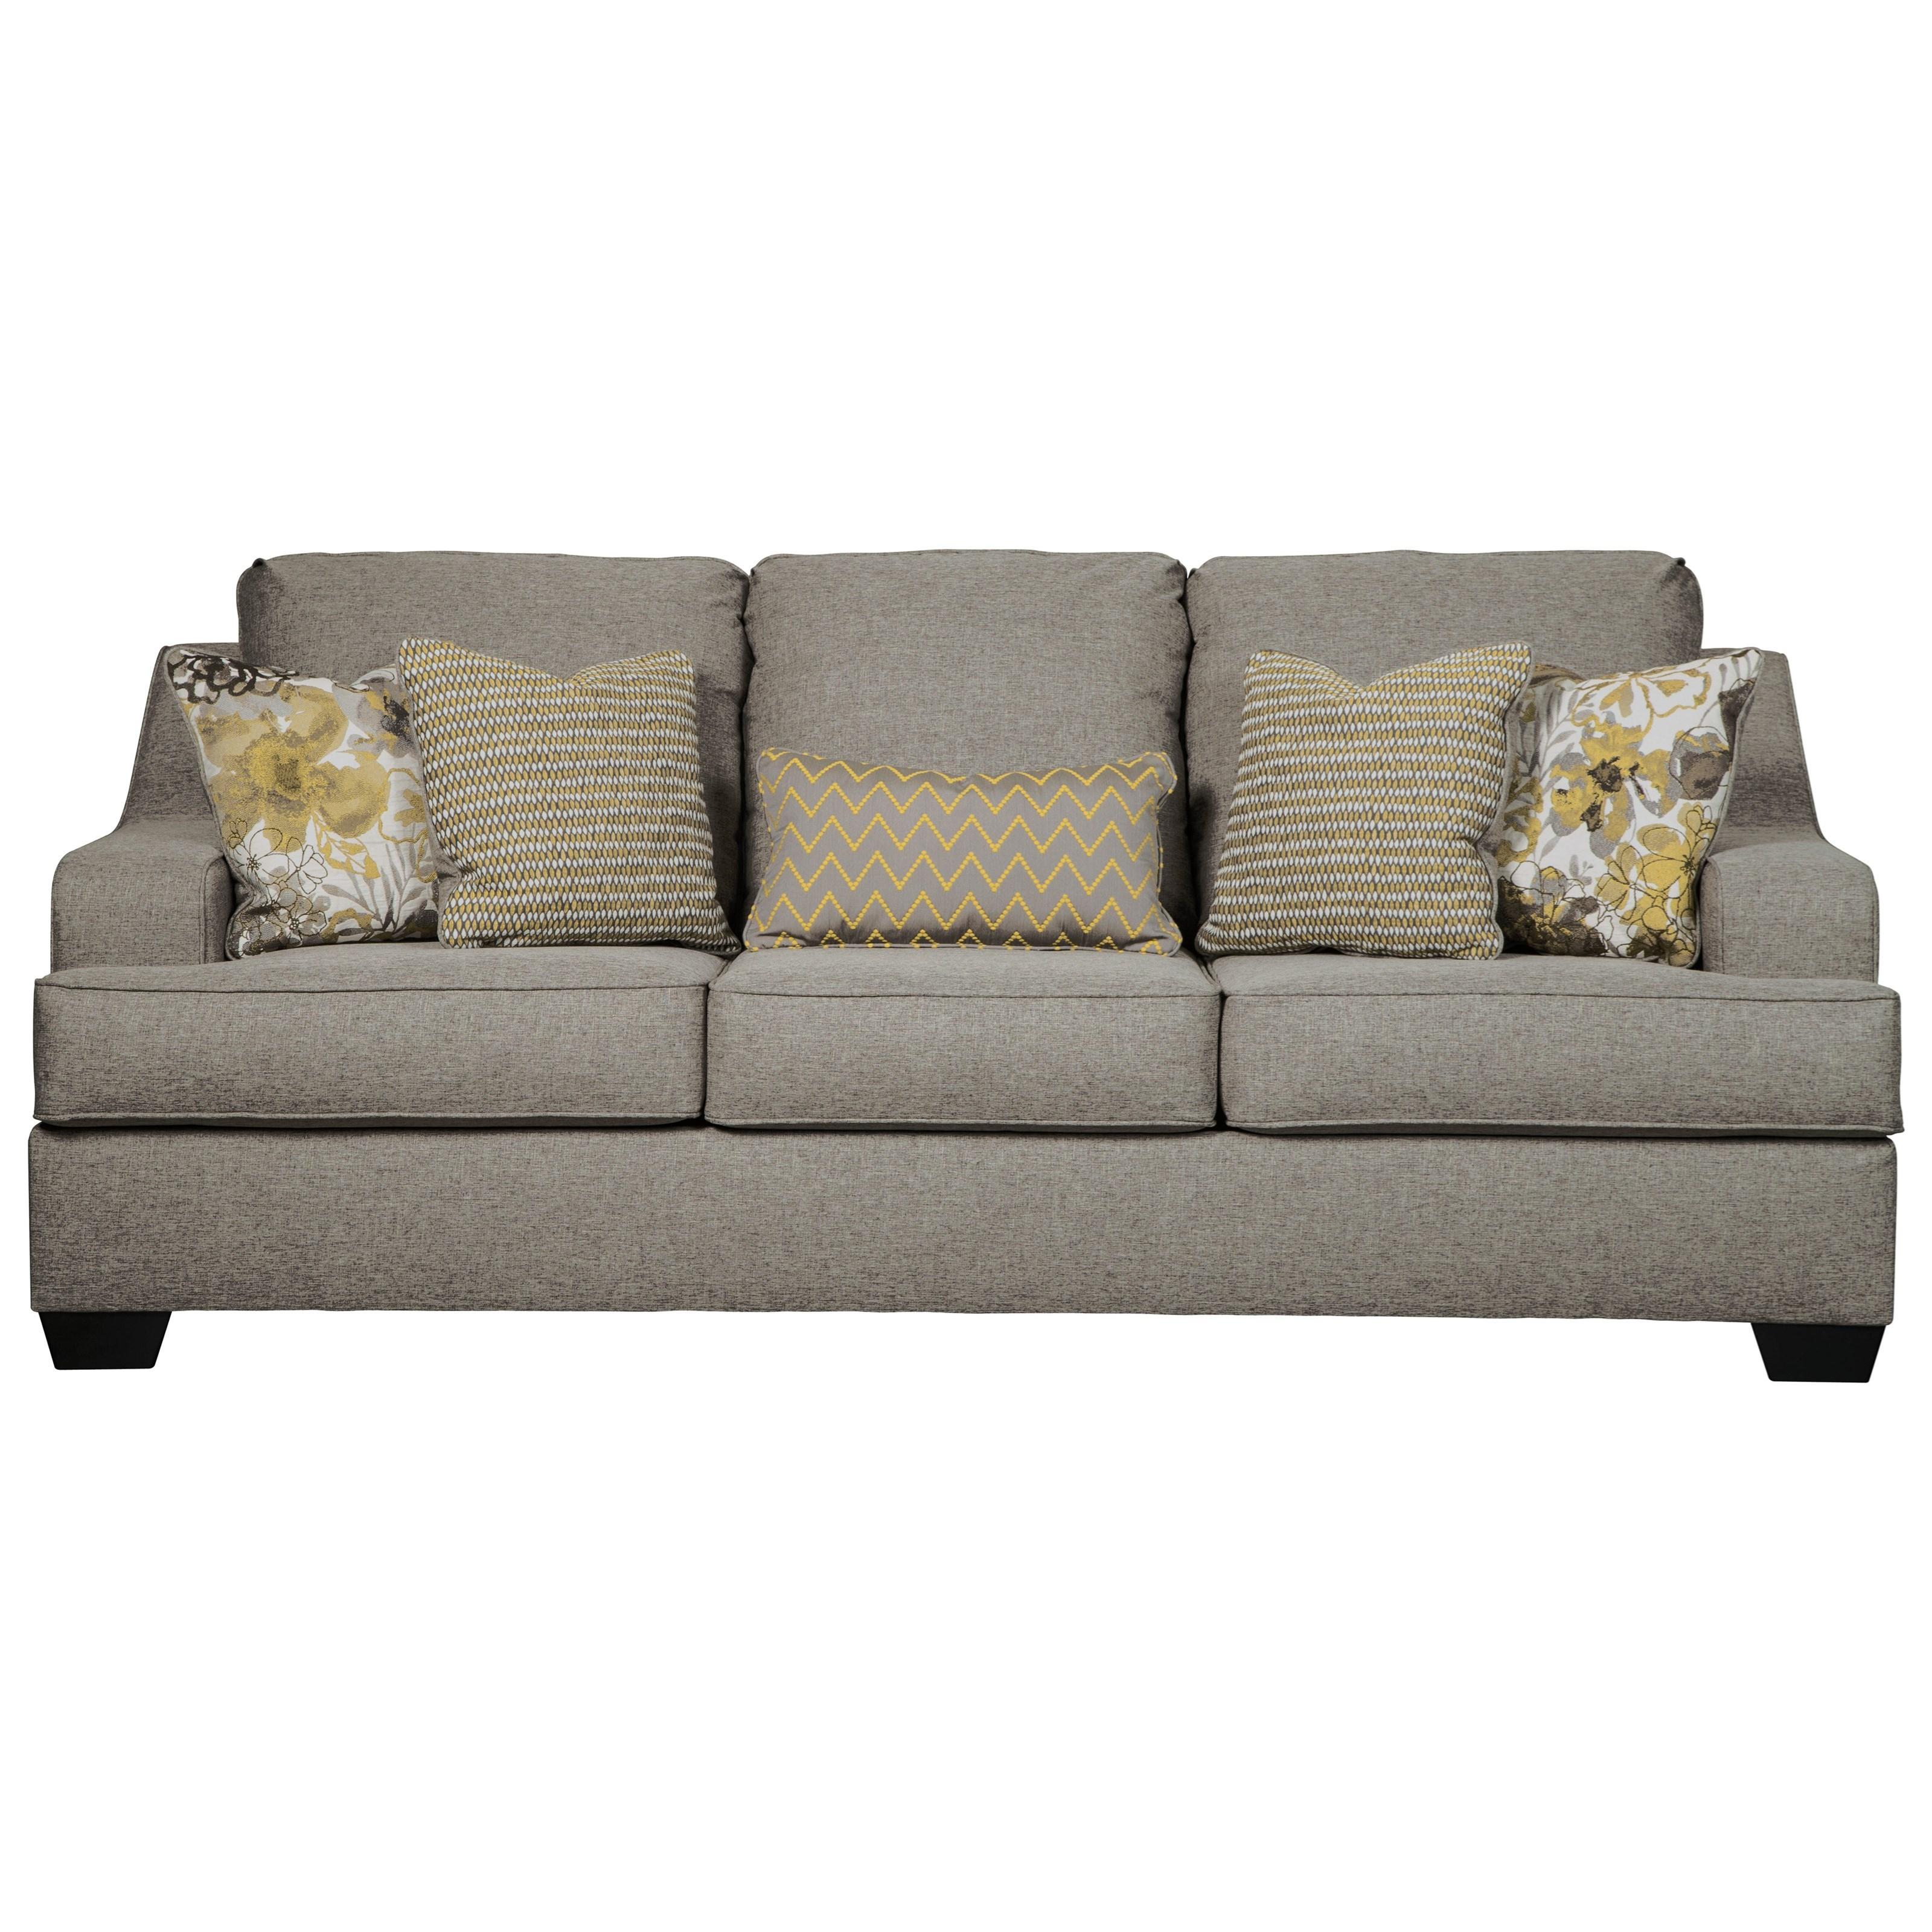 Mandee Queen Sofa Sleeper by Benchcraft at Carolina Direct